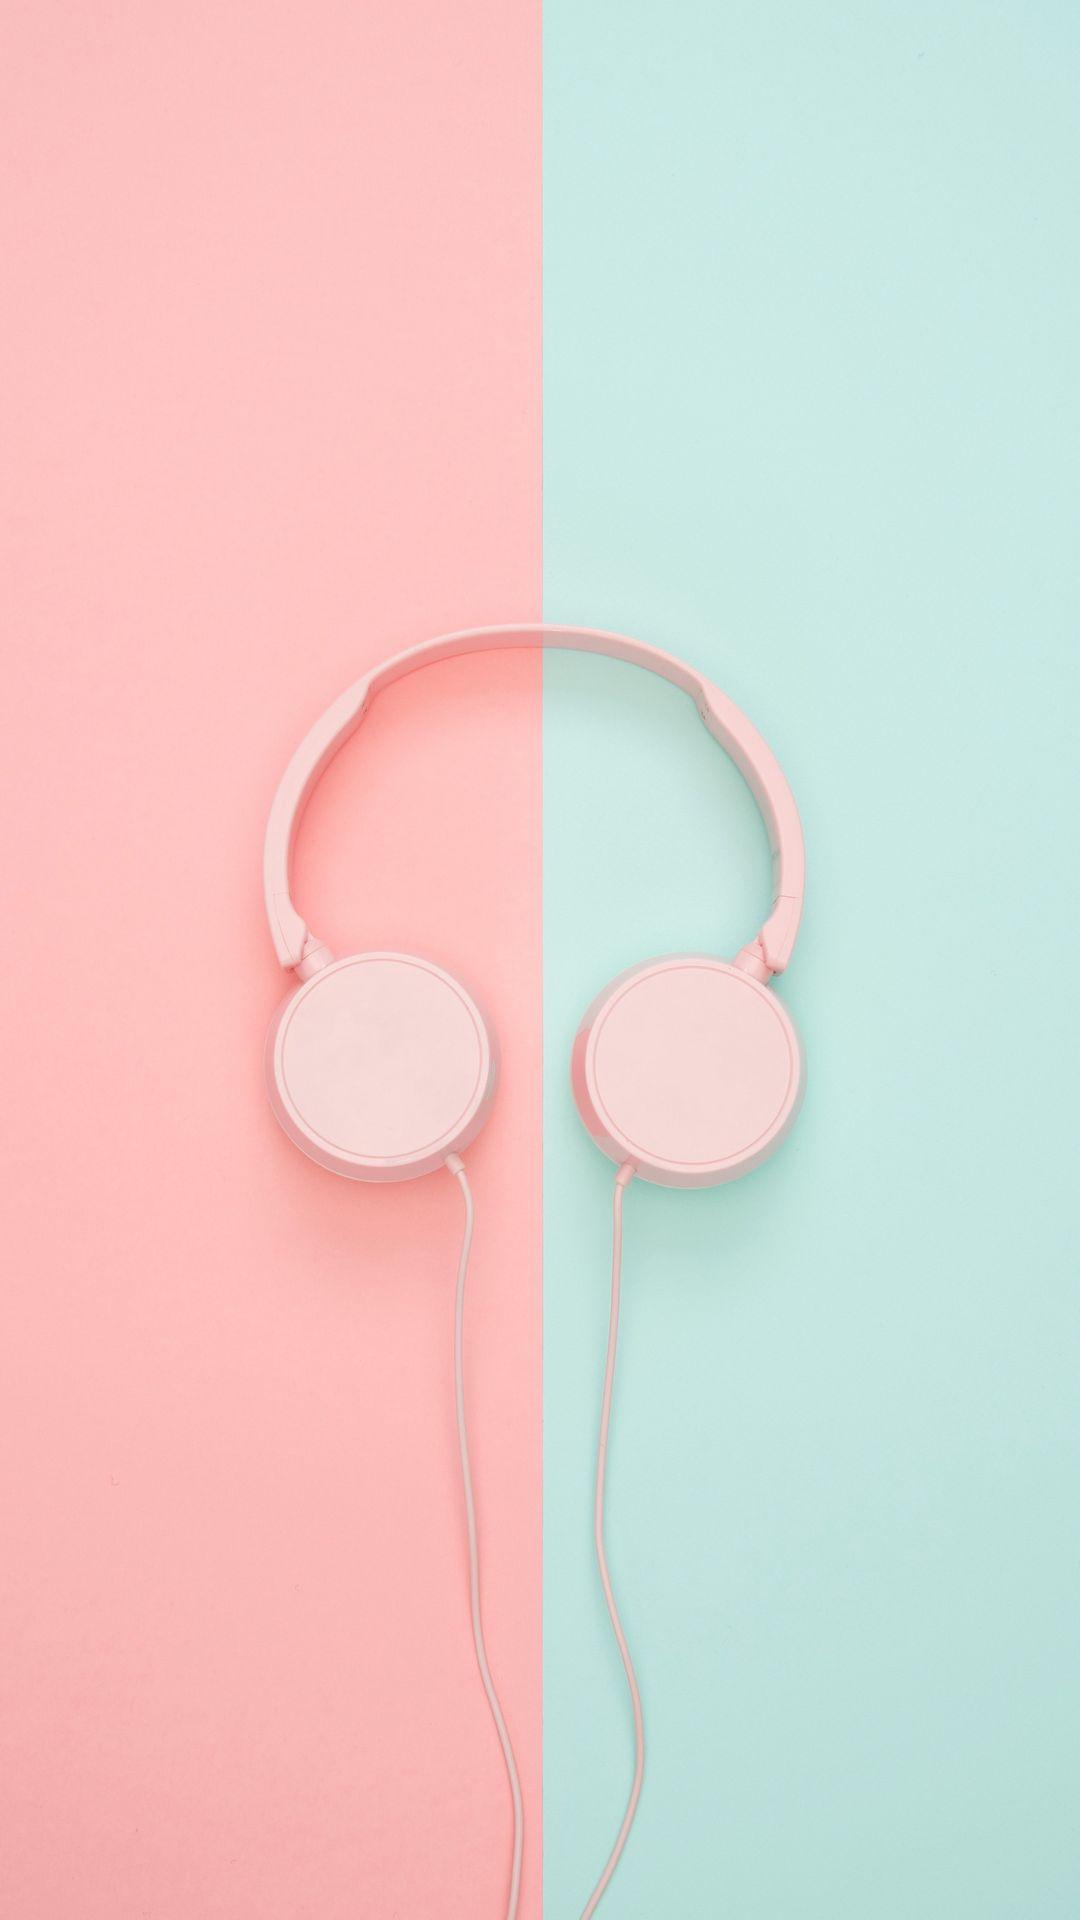 1080x1920 Wallpaper headphones, minimalism, pink, pastel